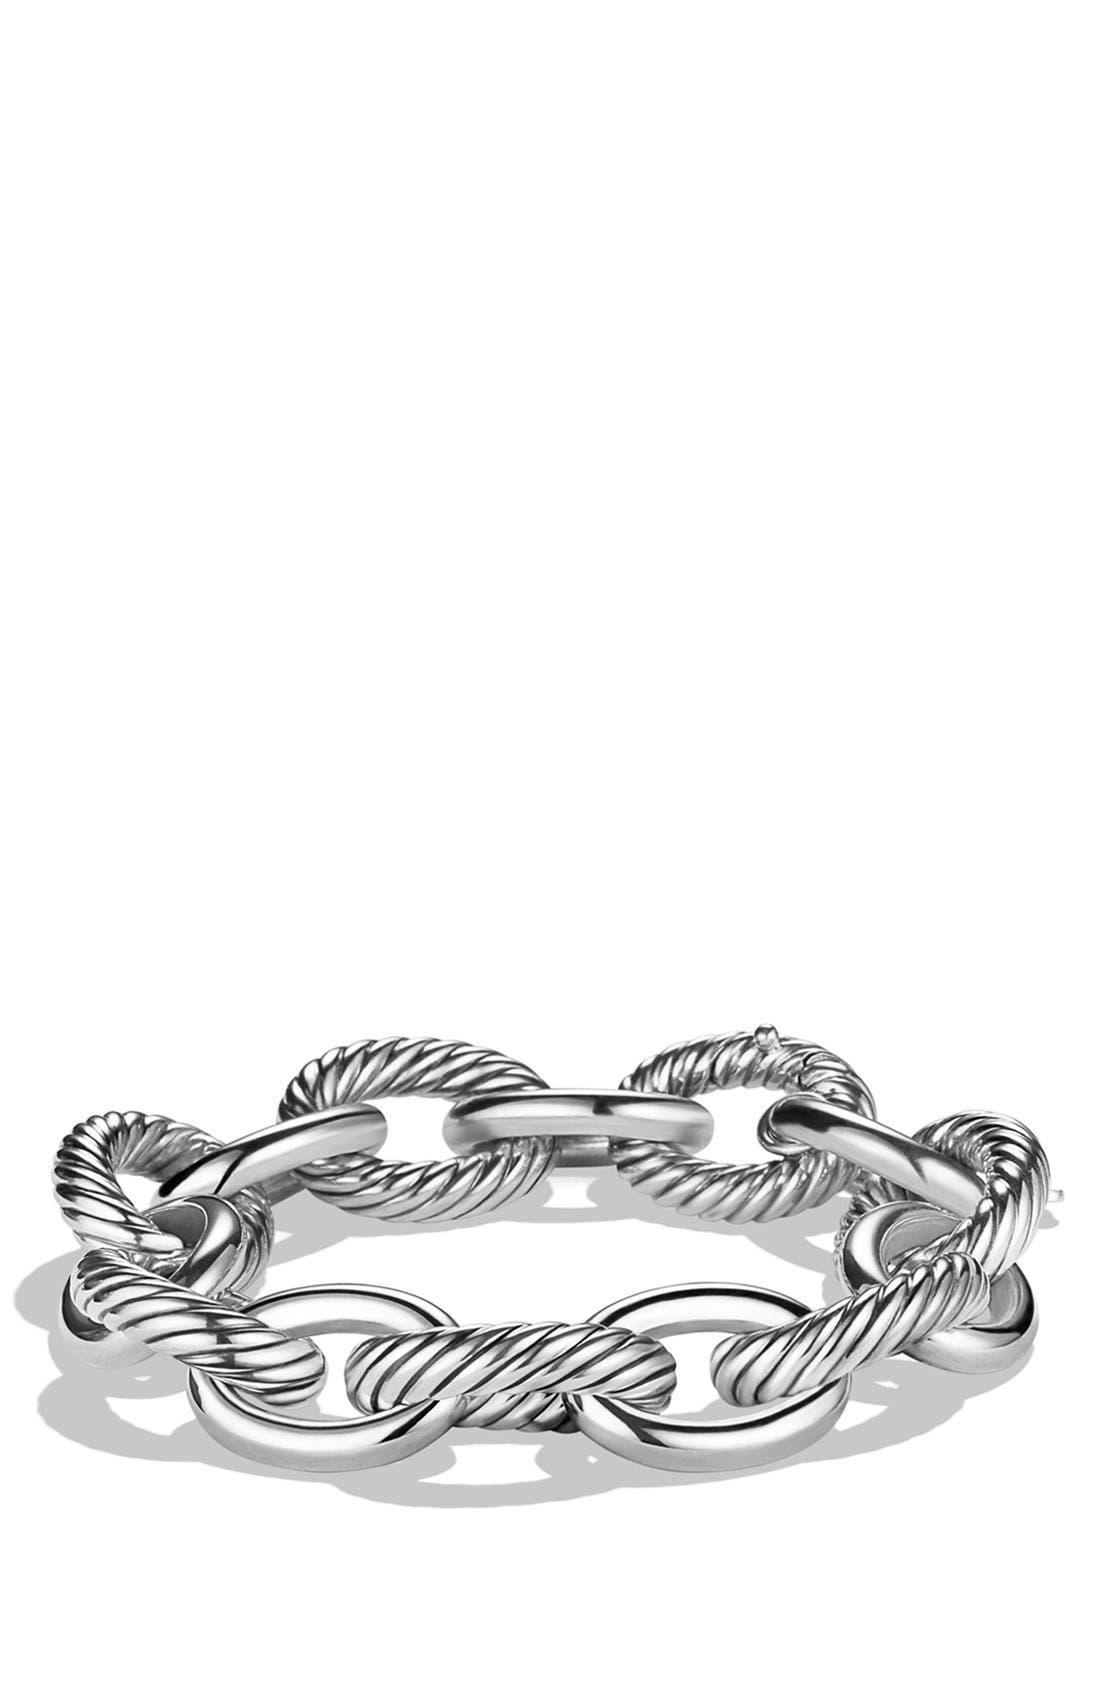 DAVID YURMAN 'Oval' Extra Large Link Bracelet, Main, color, SILVER